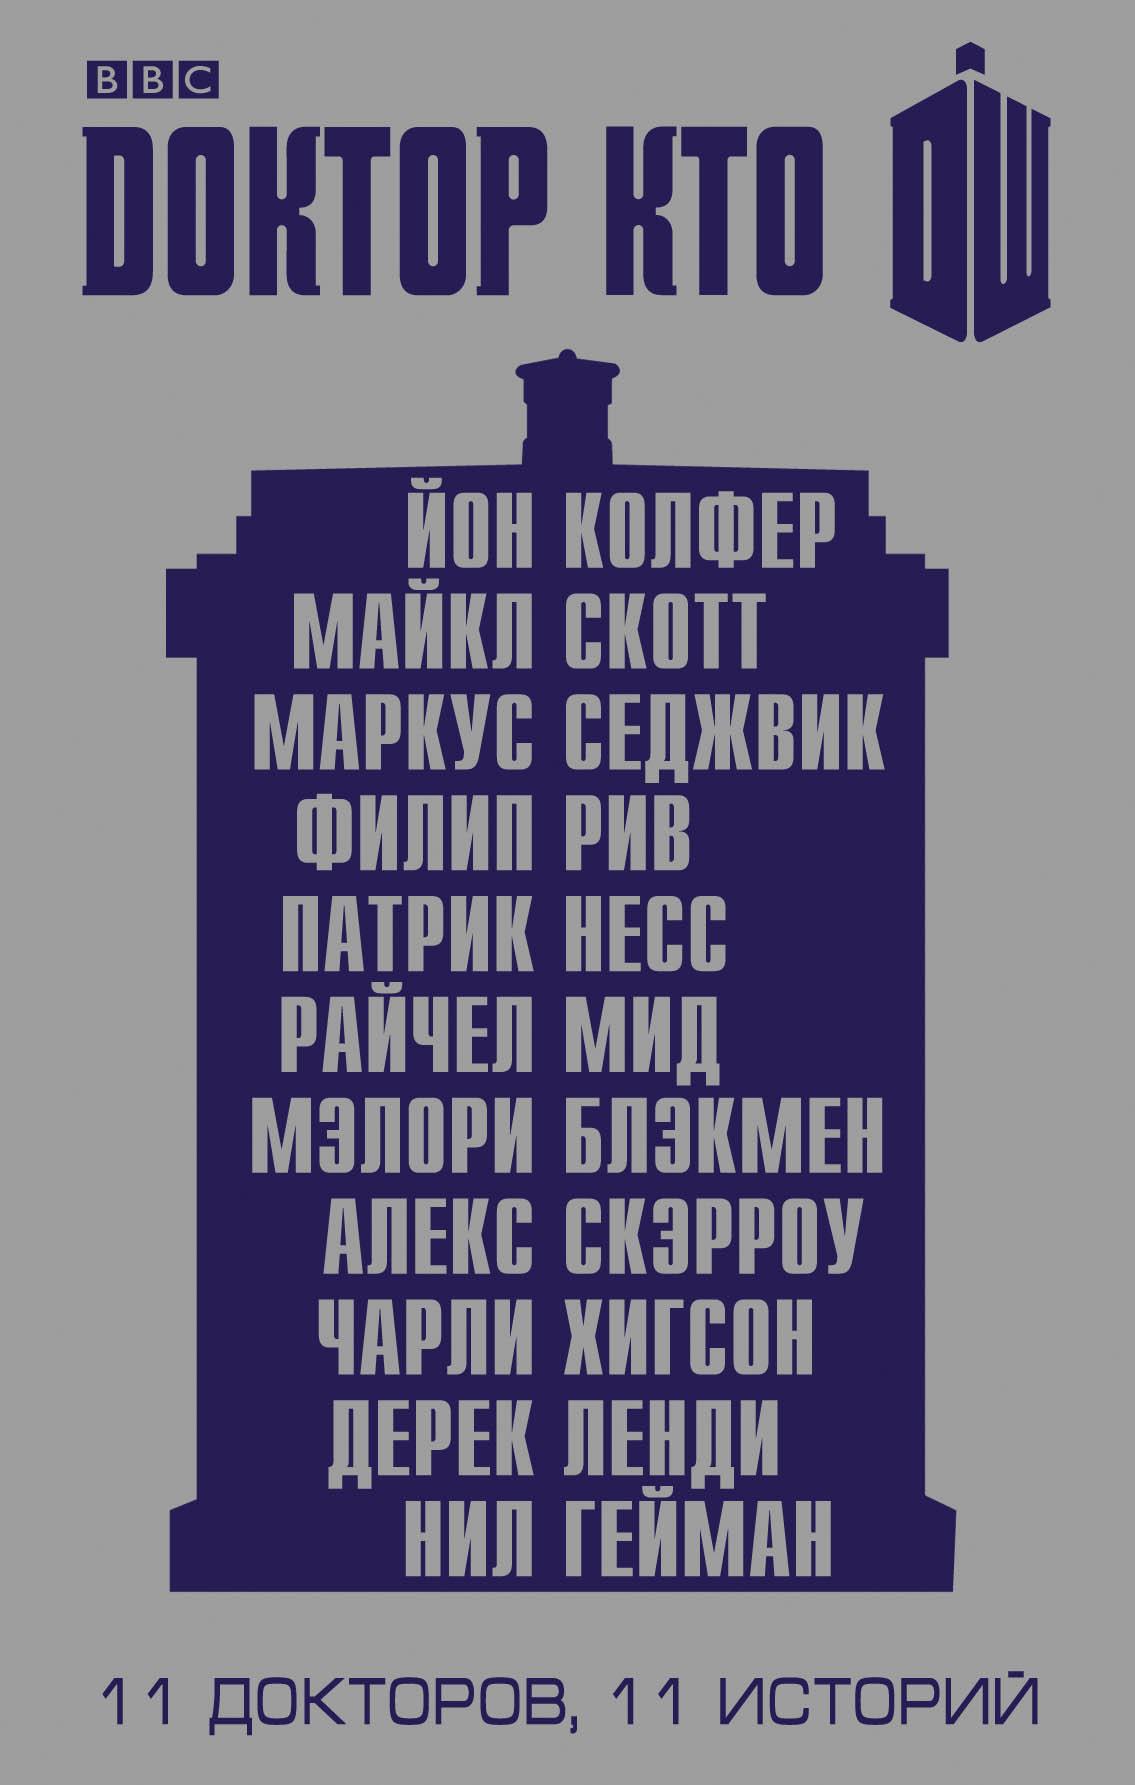 Нил Гейман Доктор Кто. 11историй (сборник) йон колфер артемис фаул последний хранитель